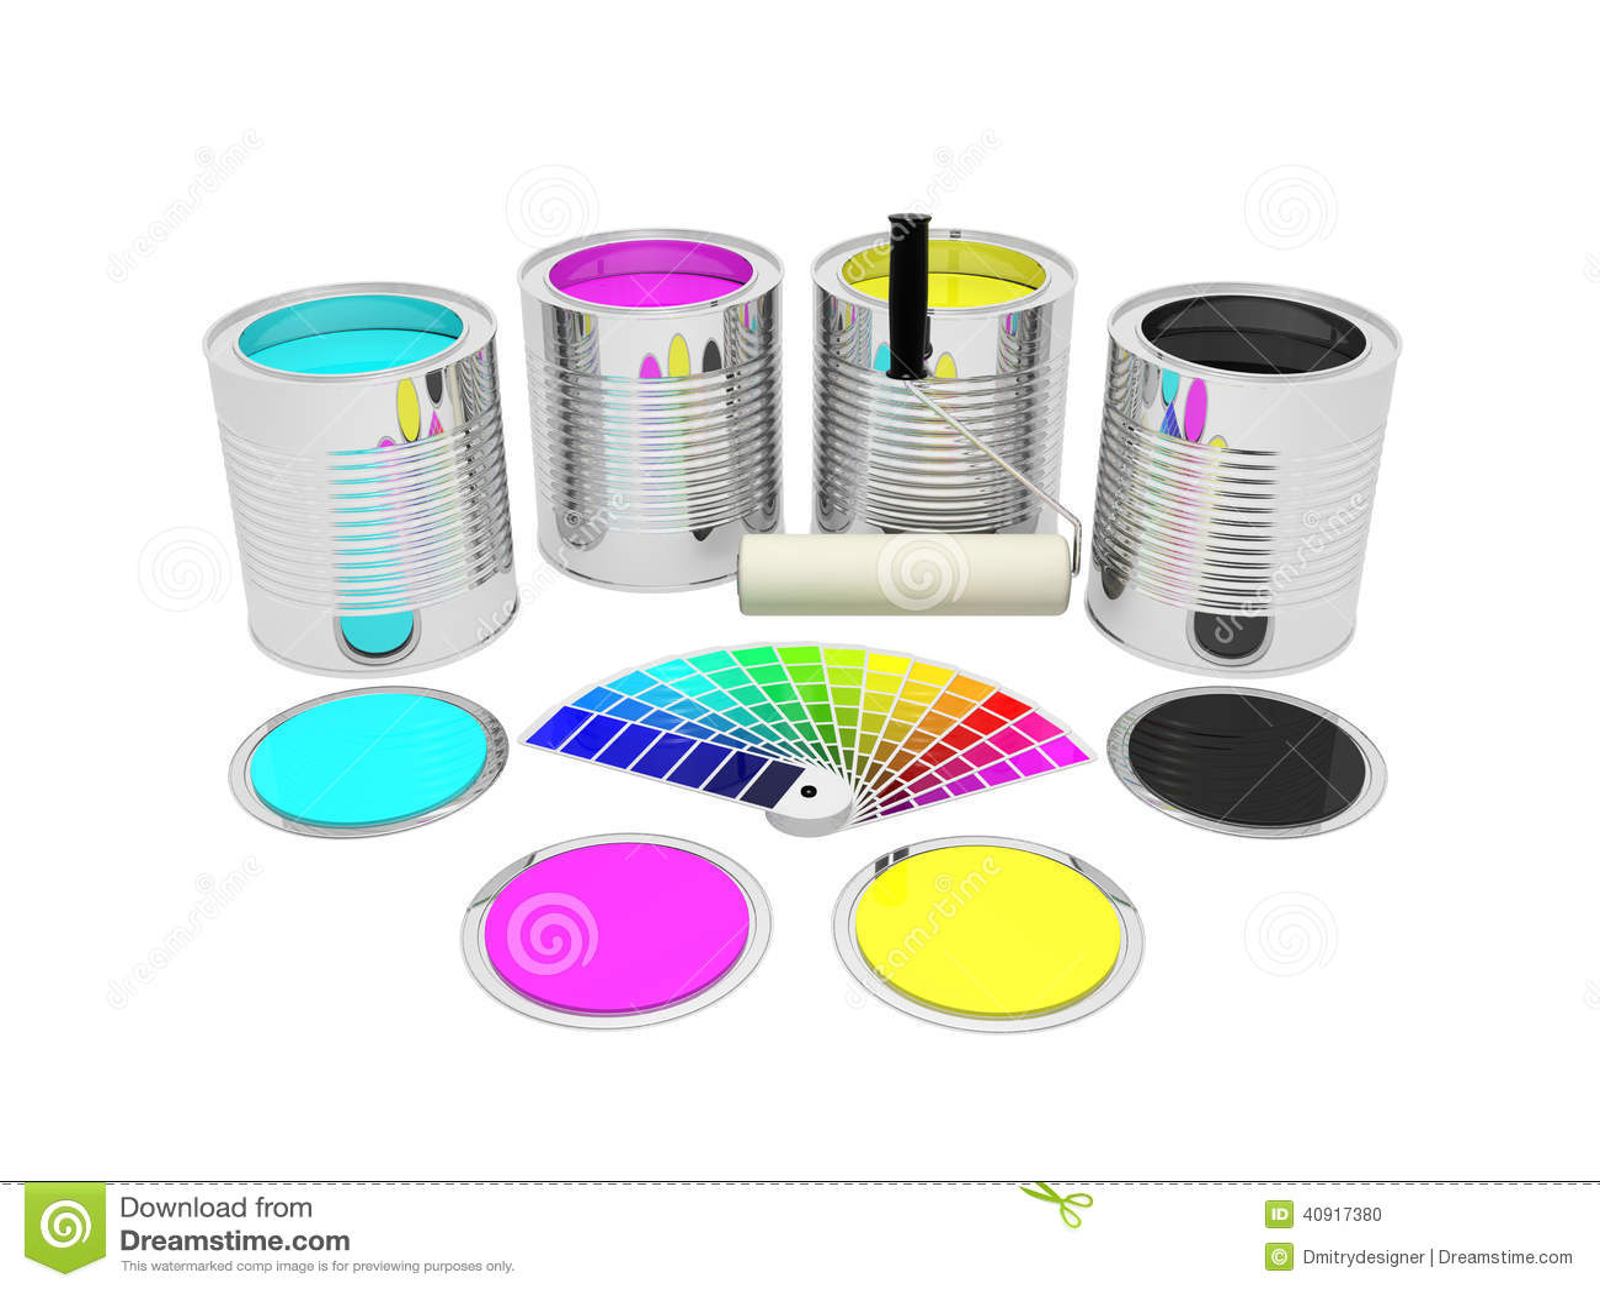 dosen mit farbefarbe und pantone stock abbildung bild 40917380. Black Bedroom Furniture Sets. Home Design Ideas